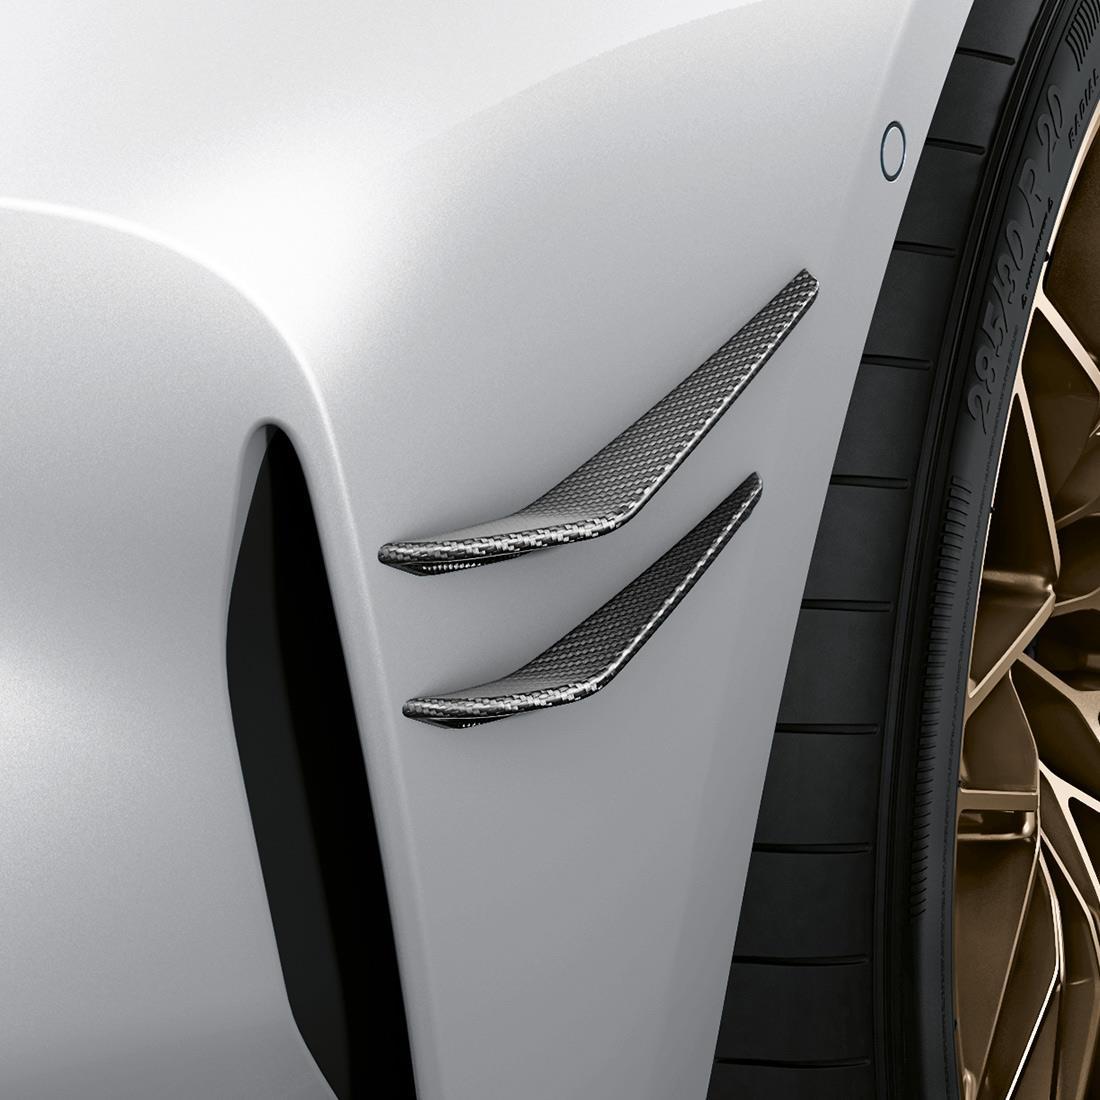 M Performance Flicks in carbon fiber